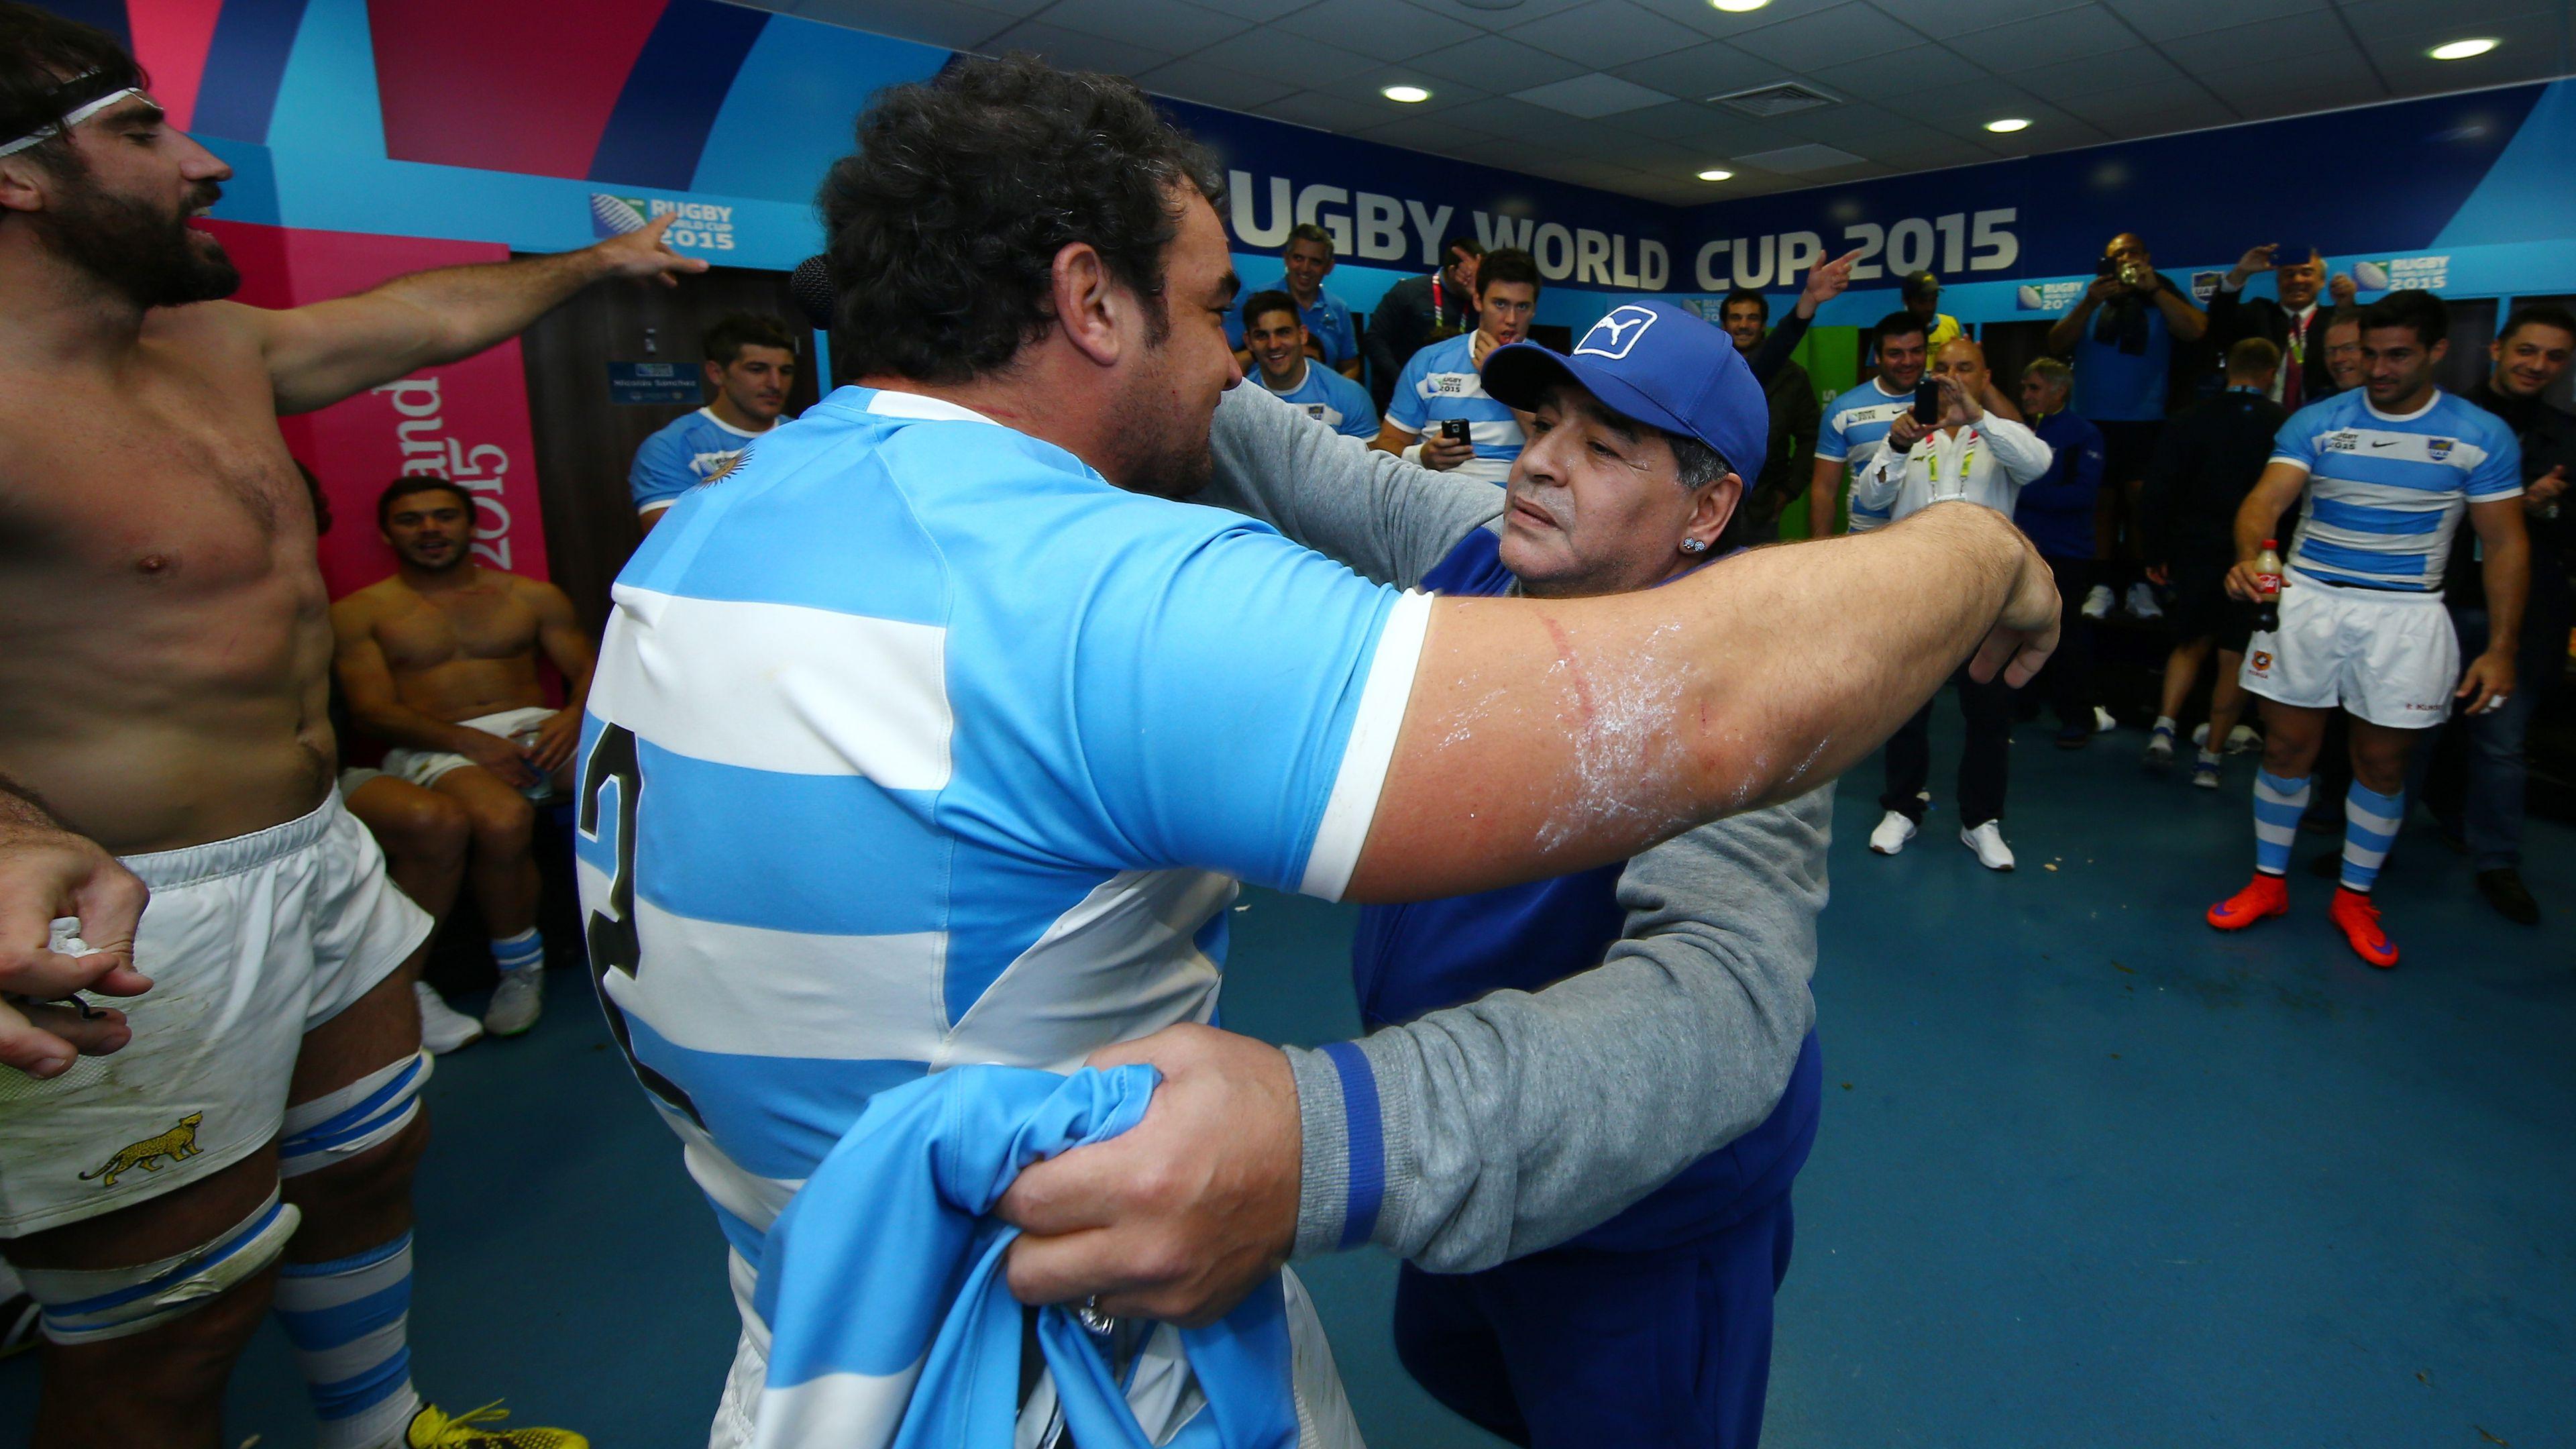 Argentina rugby team to harness emotion v All Blacks after Diego Maradona's death